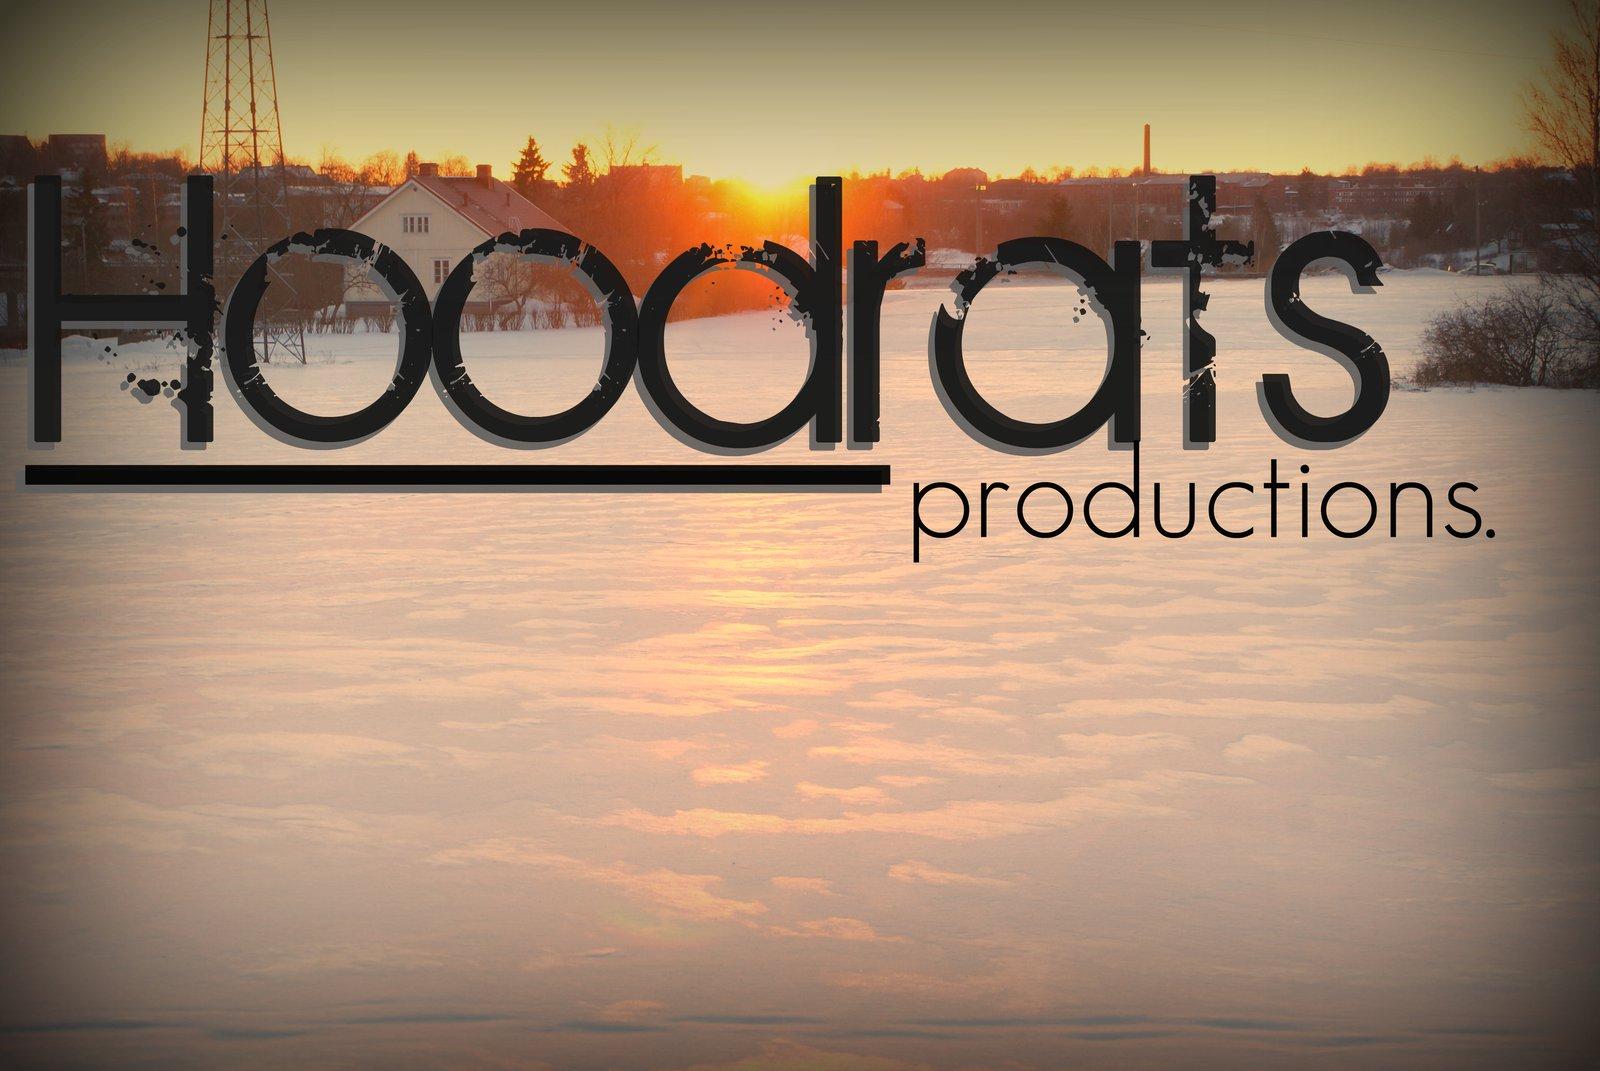 Hoodrats